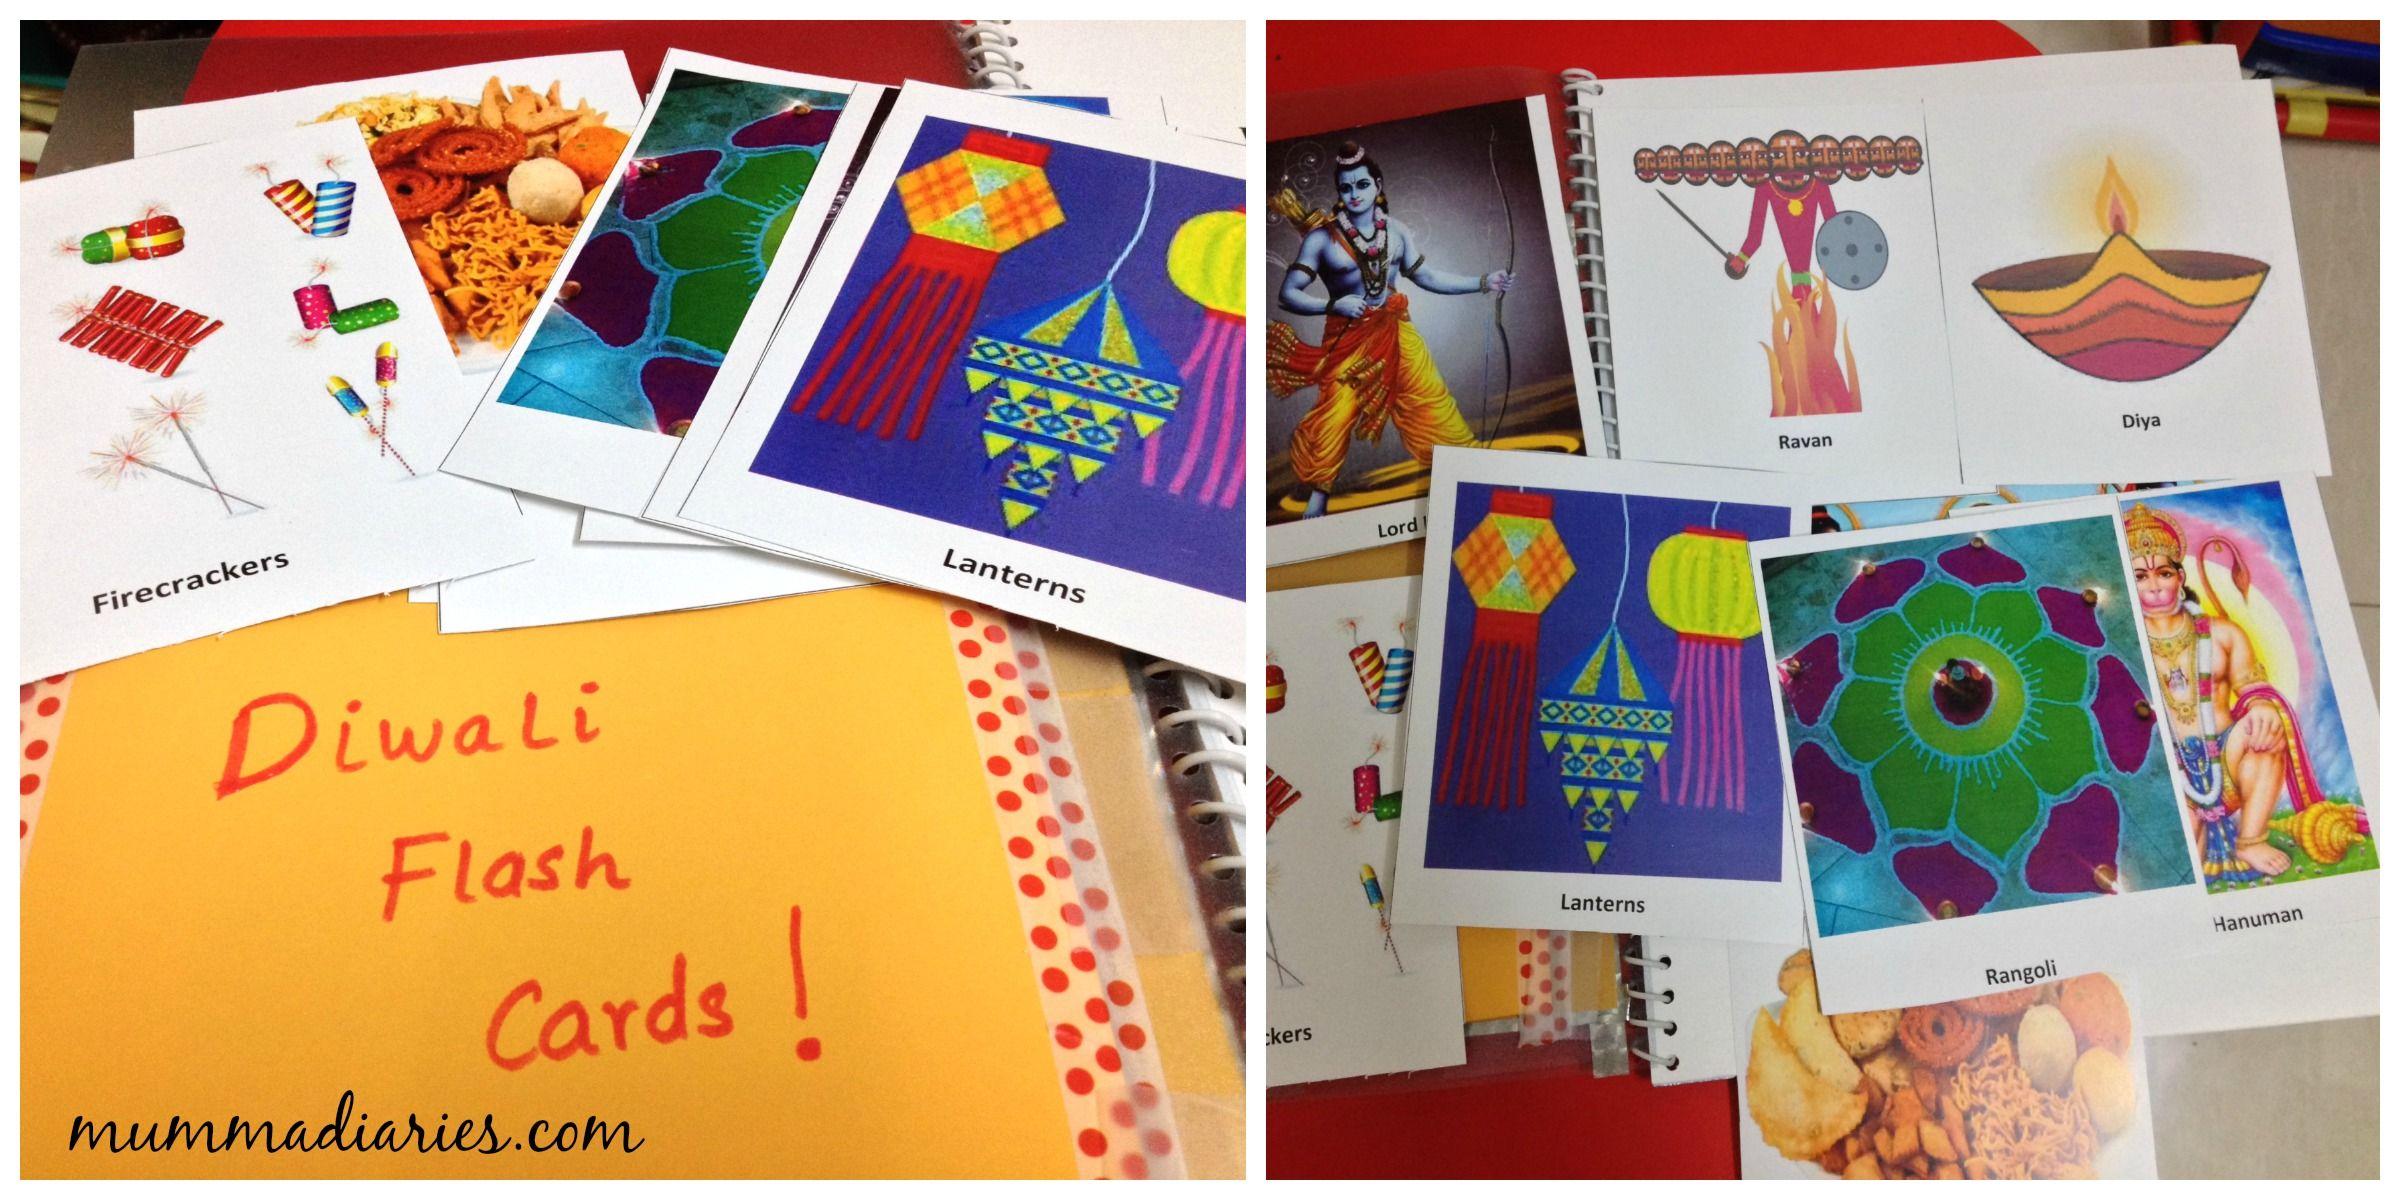 Diwali Cards Diwali Cards And Crafts Pinterest Diwali Cards